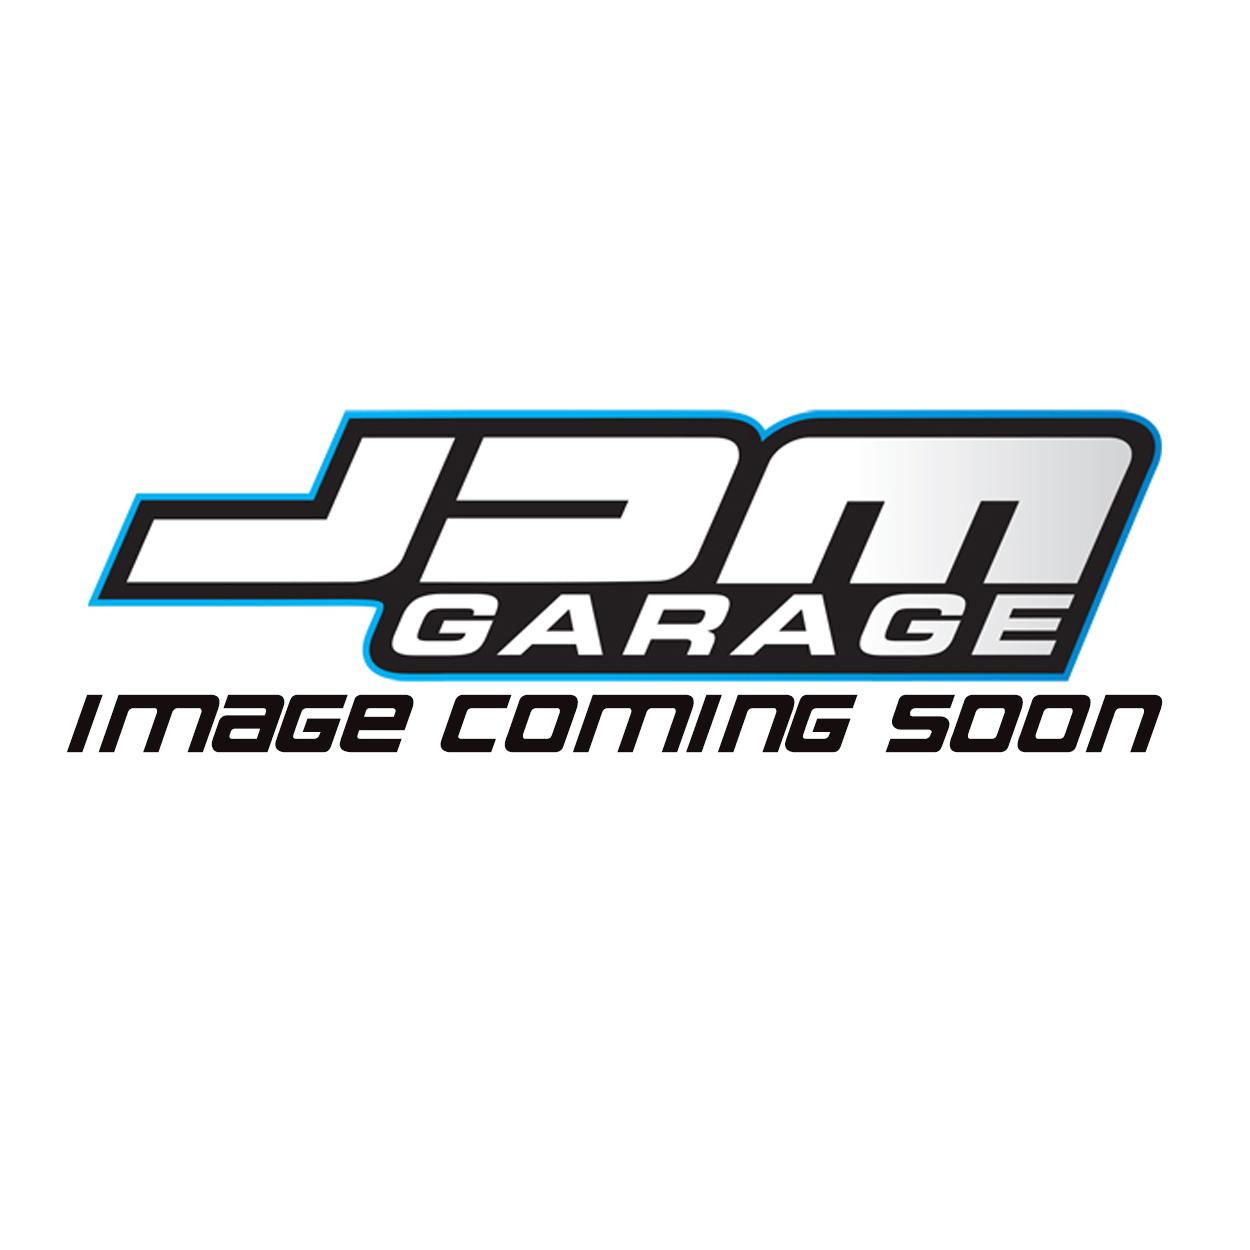 Genuine Throttle Body Cable Nissan Silvia S14 200SX / S15 SR20DET 18201-65F00